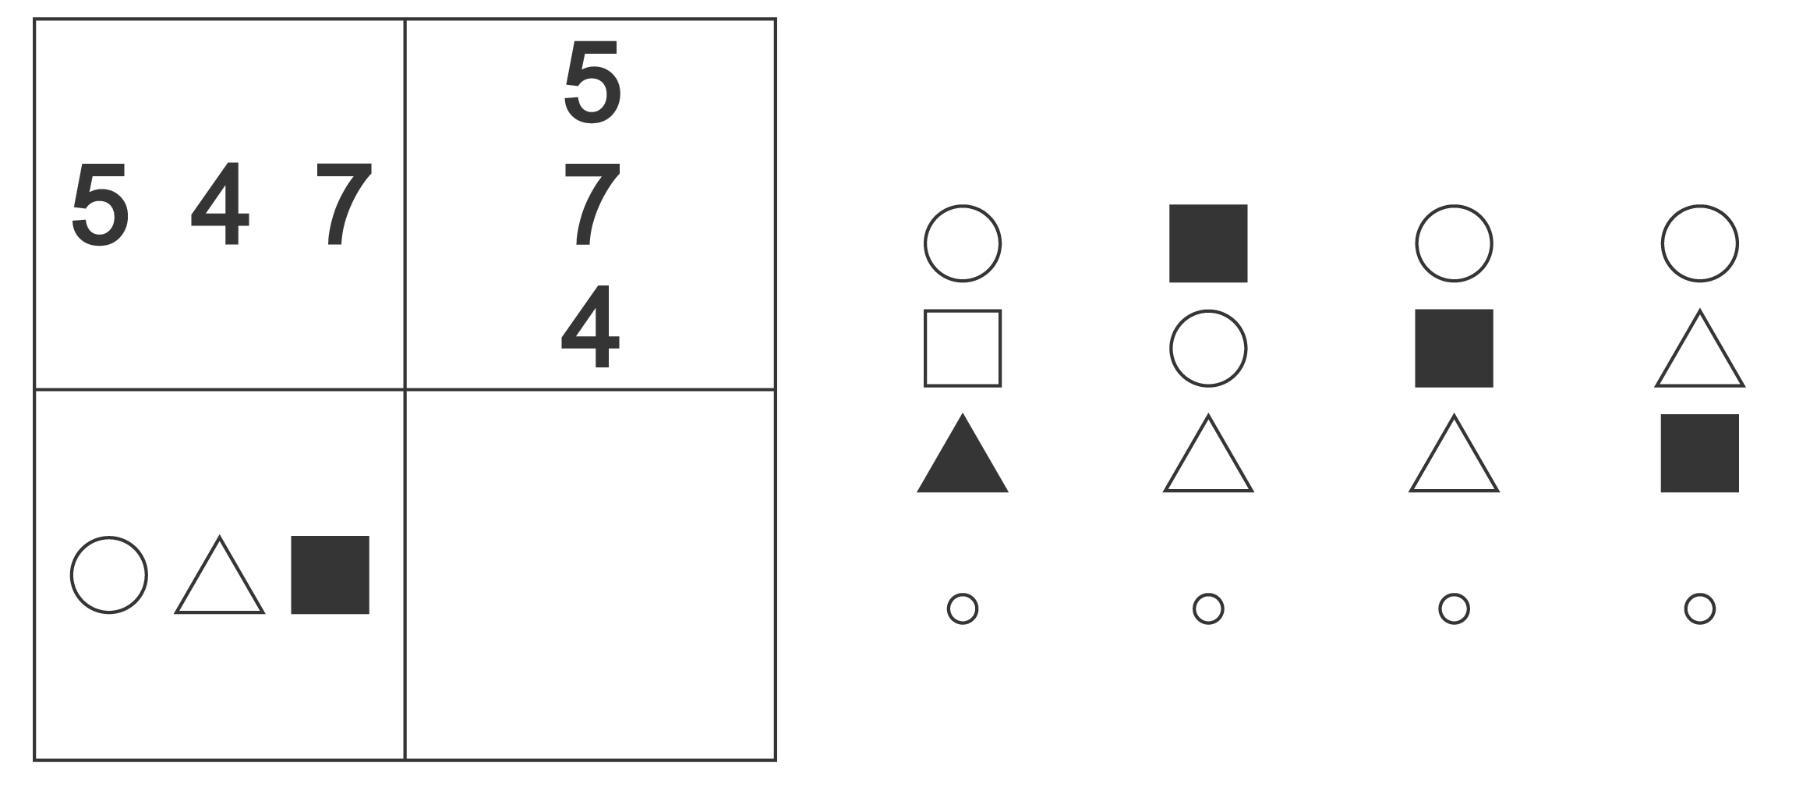 Sample Test Items